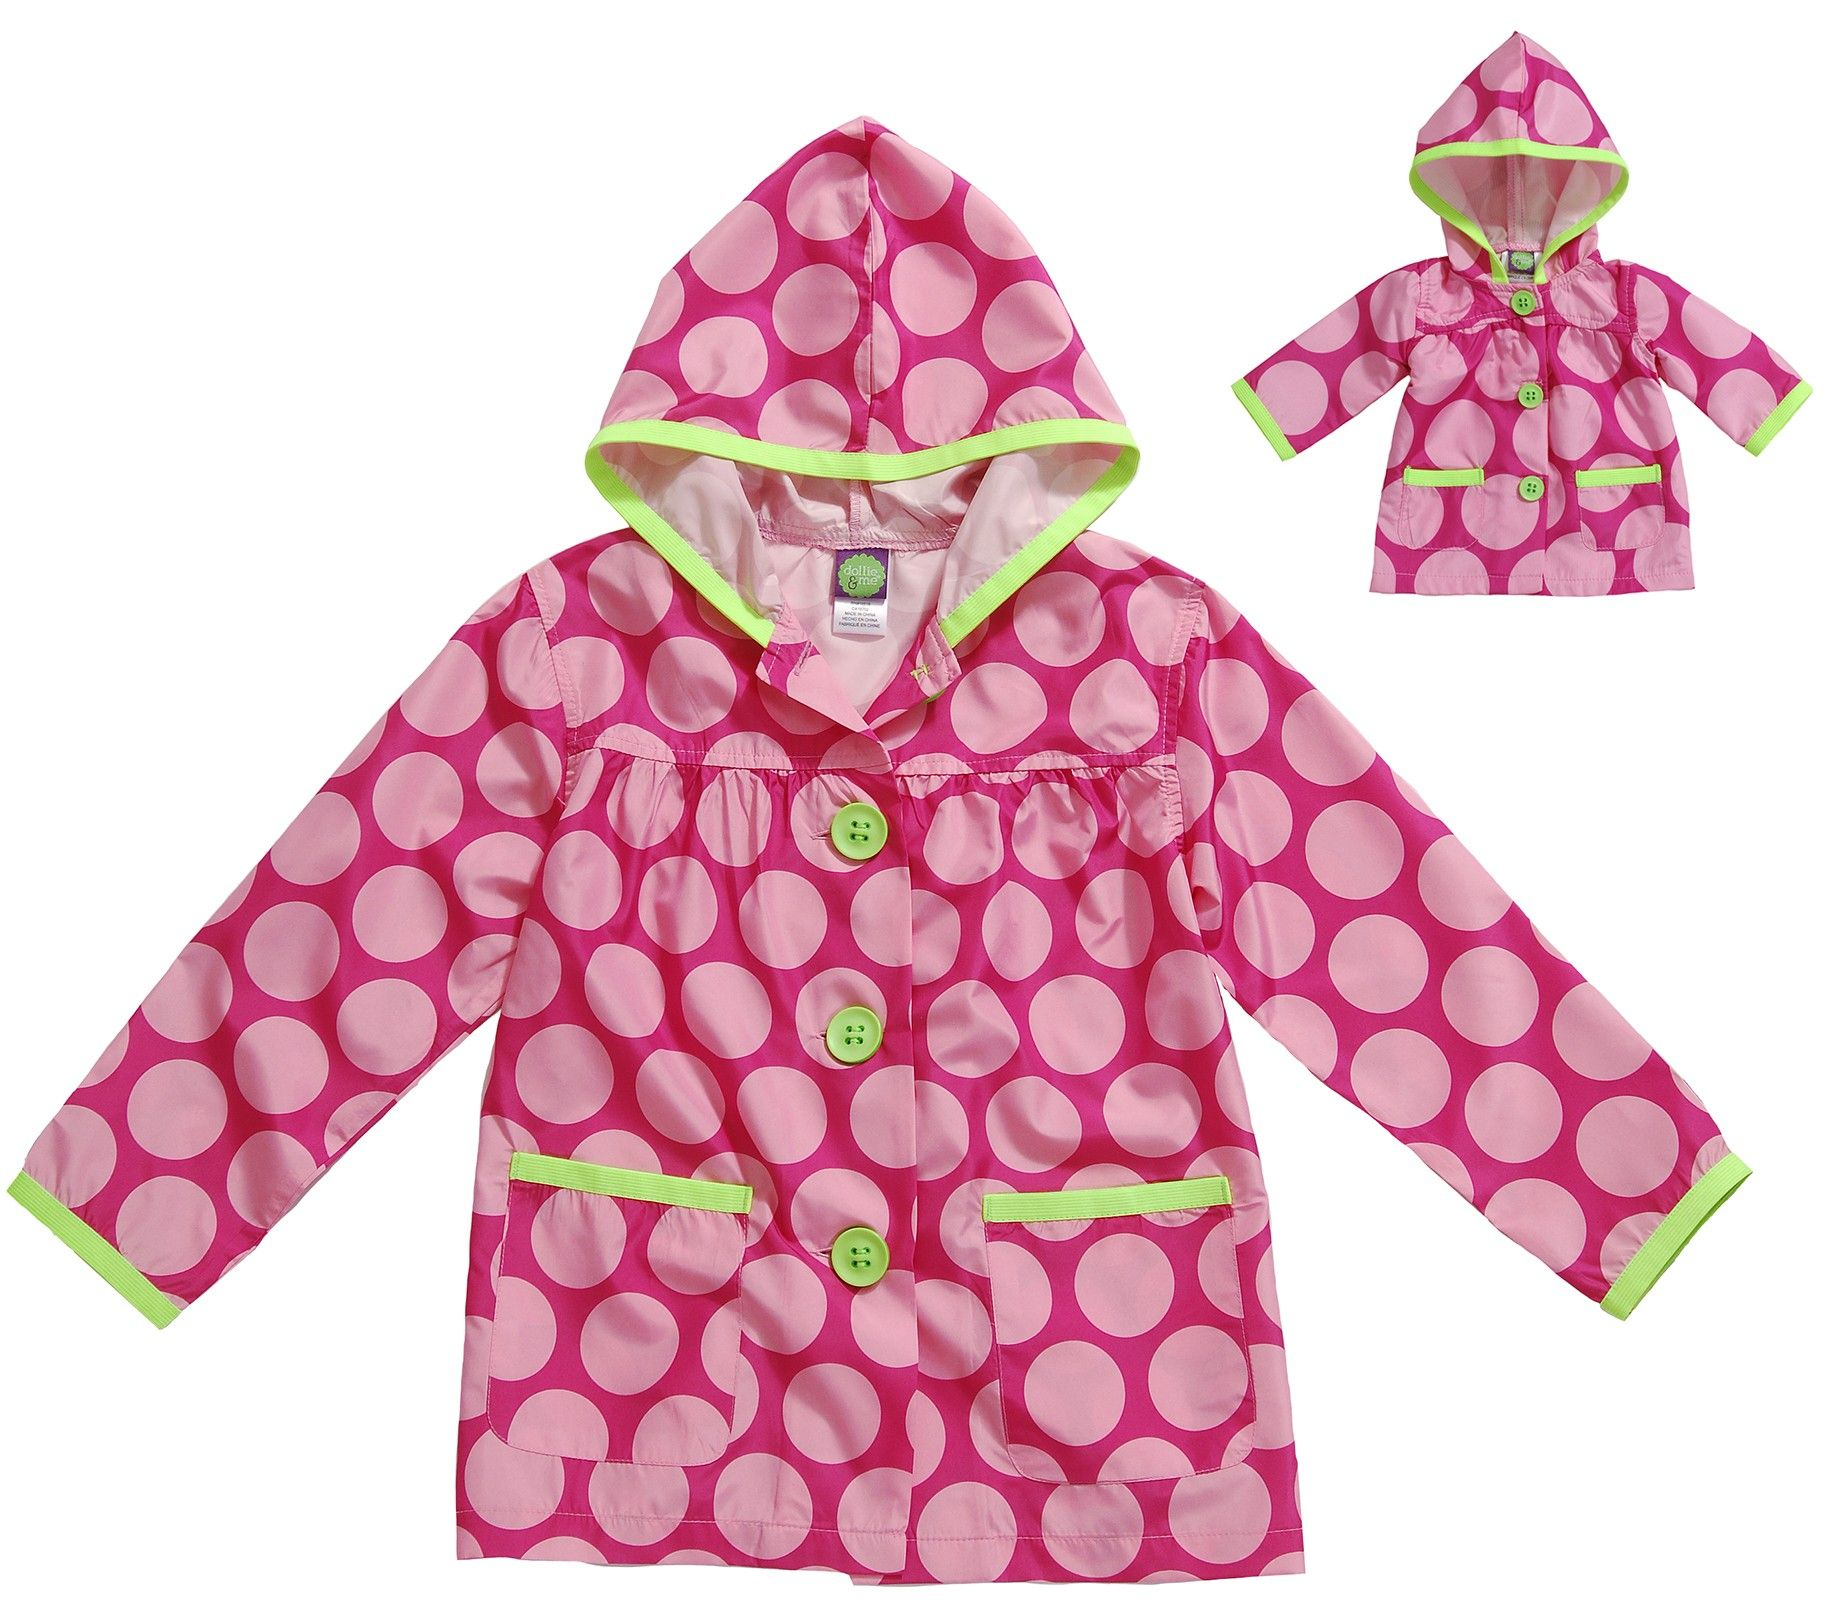 Pin On Rainy Day Clothing